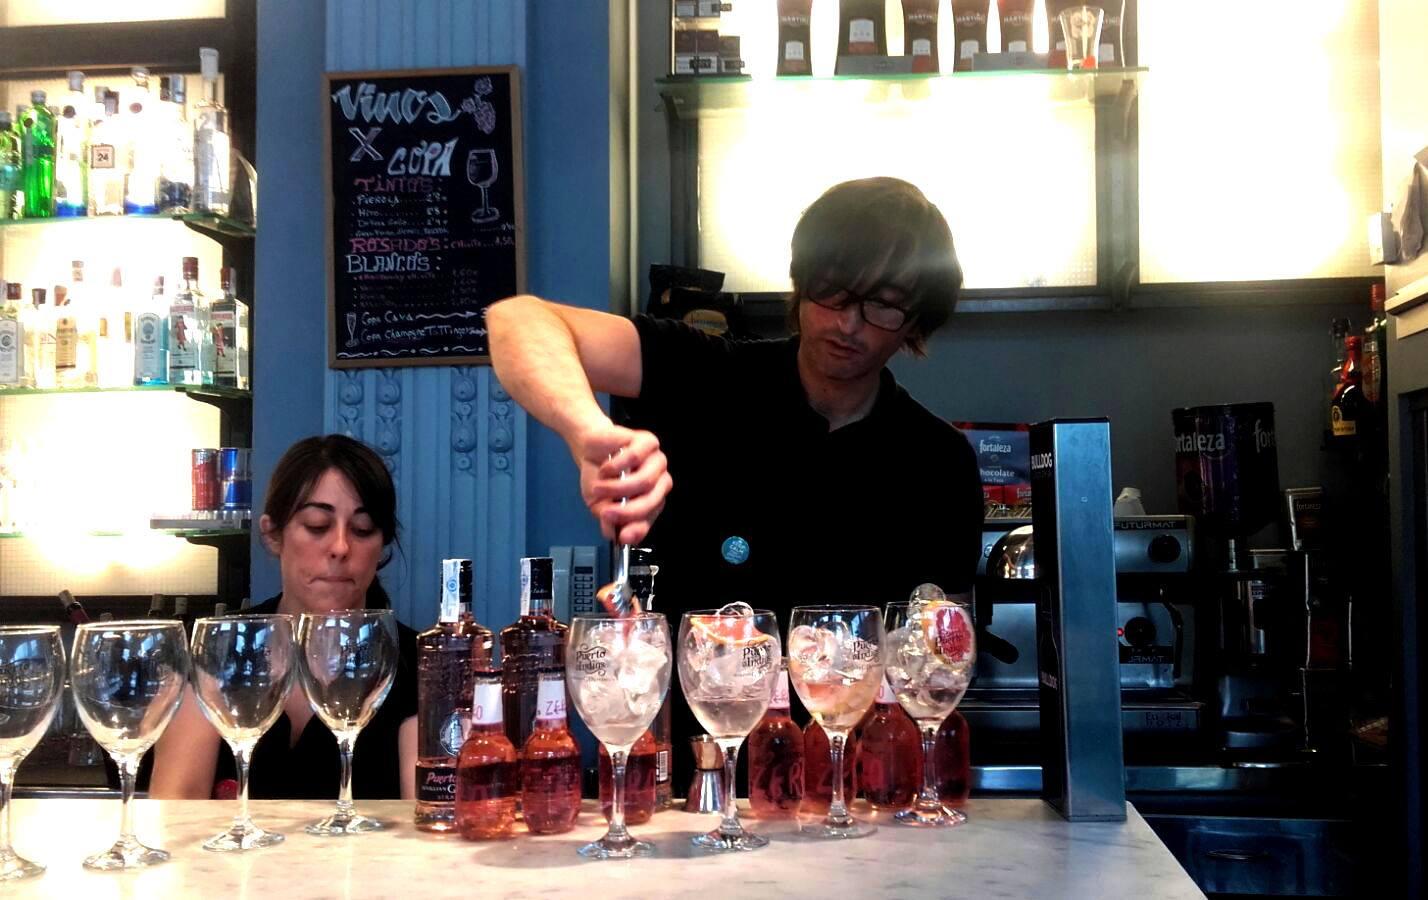 ¿Apetece una copa?. Foto: Victoria Café.